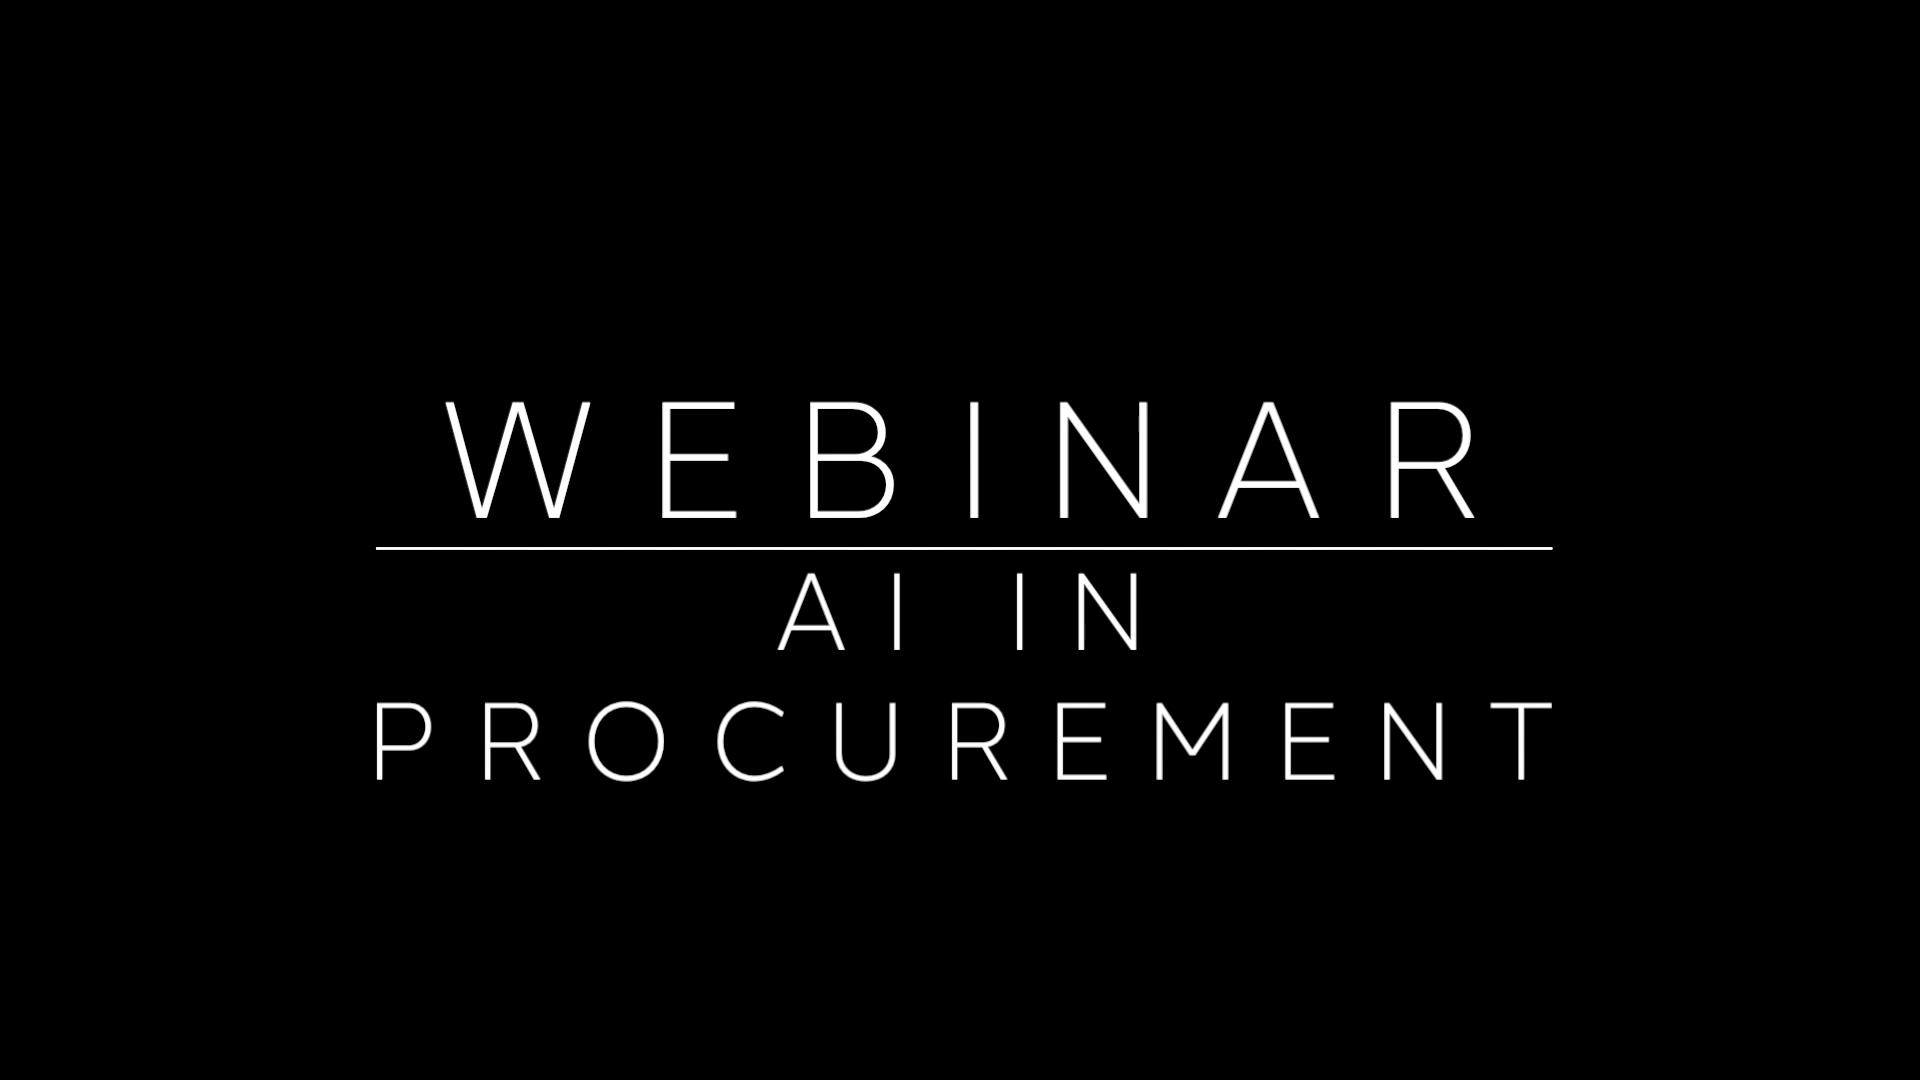 webinar-ai-in-procurement-teaser